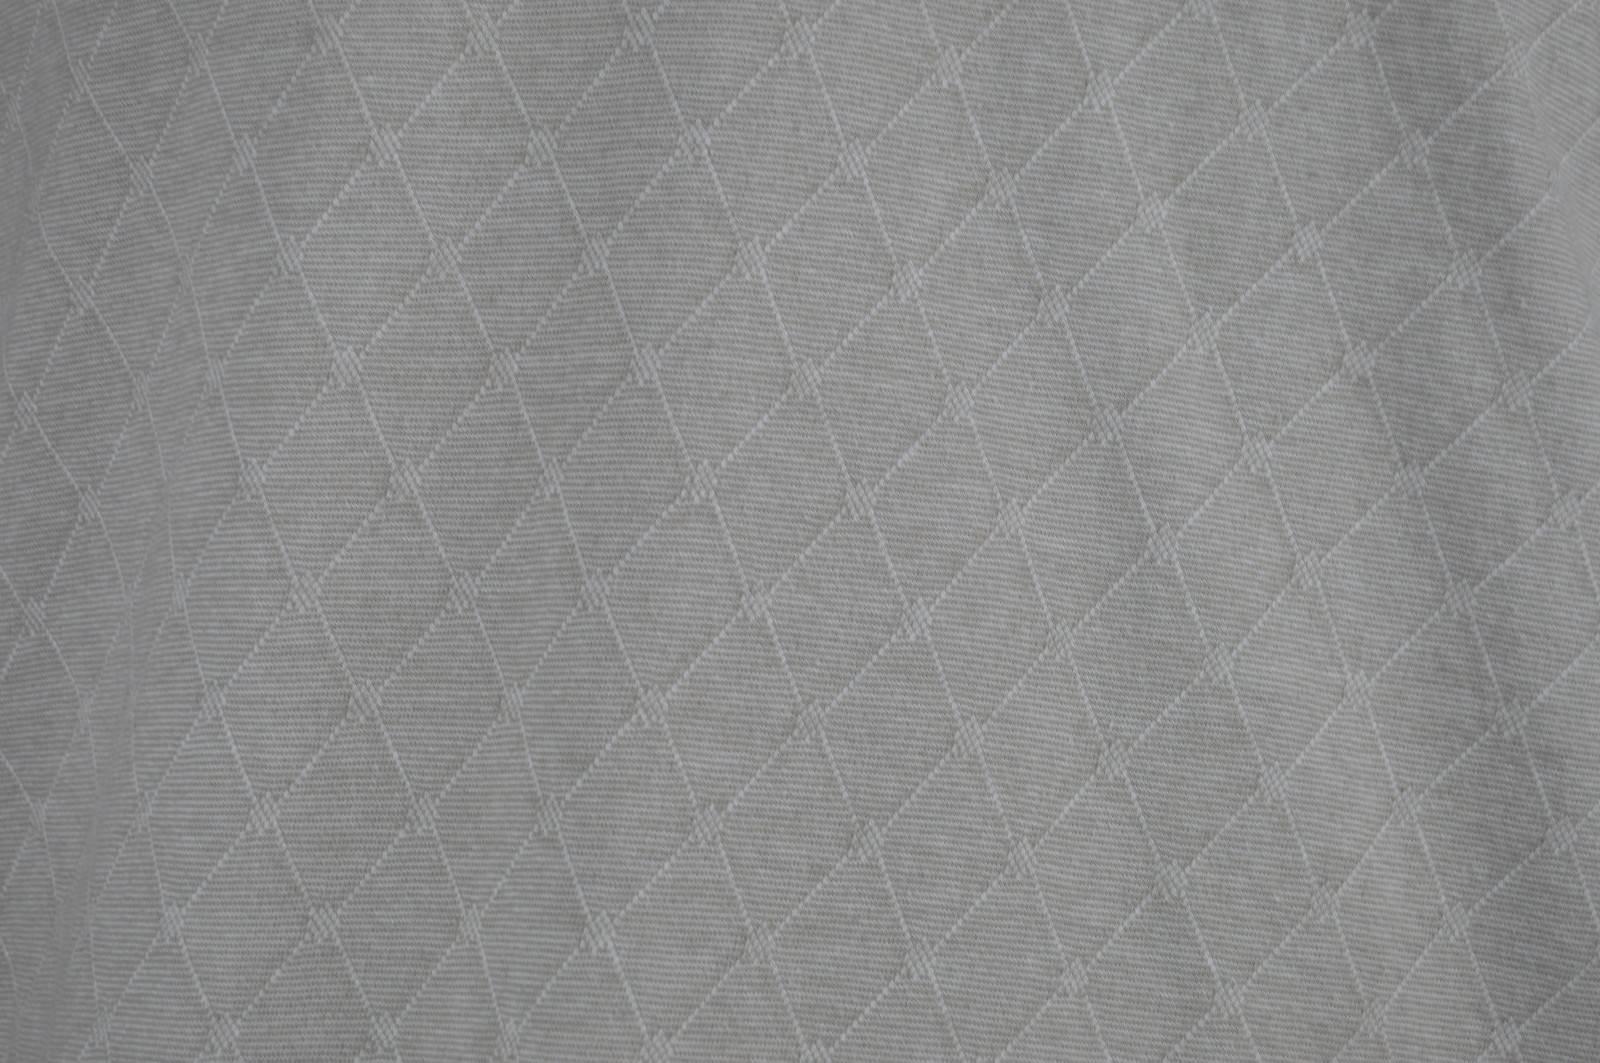 Tasso Elba L Mens Short Sleeve Golf Polo Shirt Beige diamond geometric print